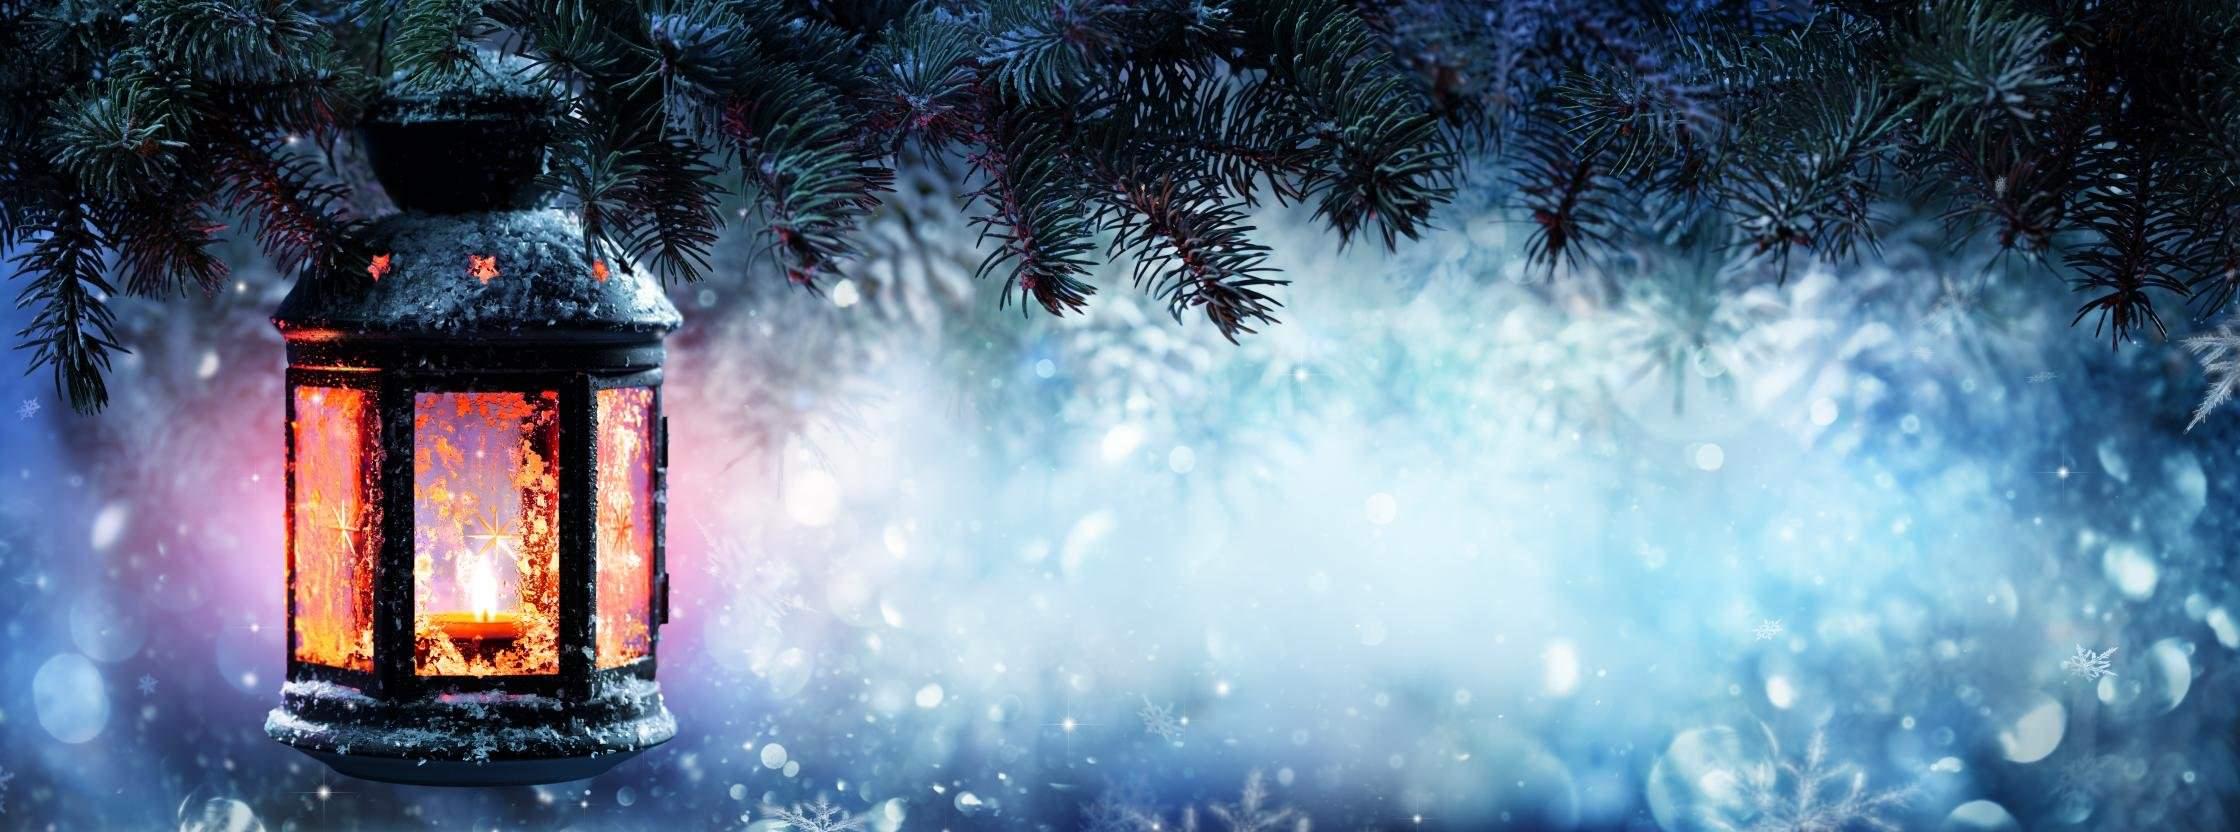 Dual Screen Christmas Wallpapers Top Free Dual Screen Christmas Backgrounds Wallpaperaccess